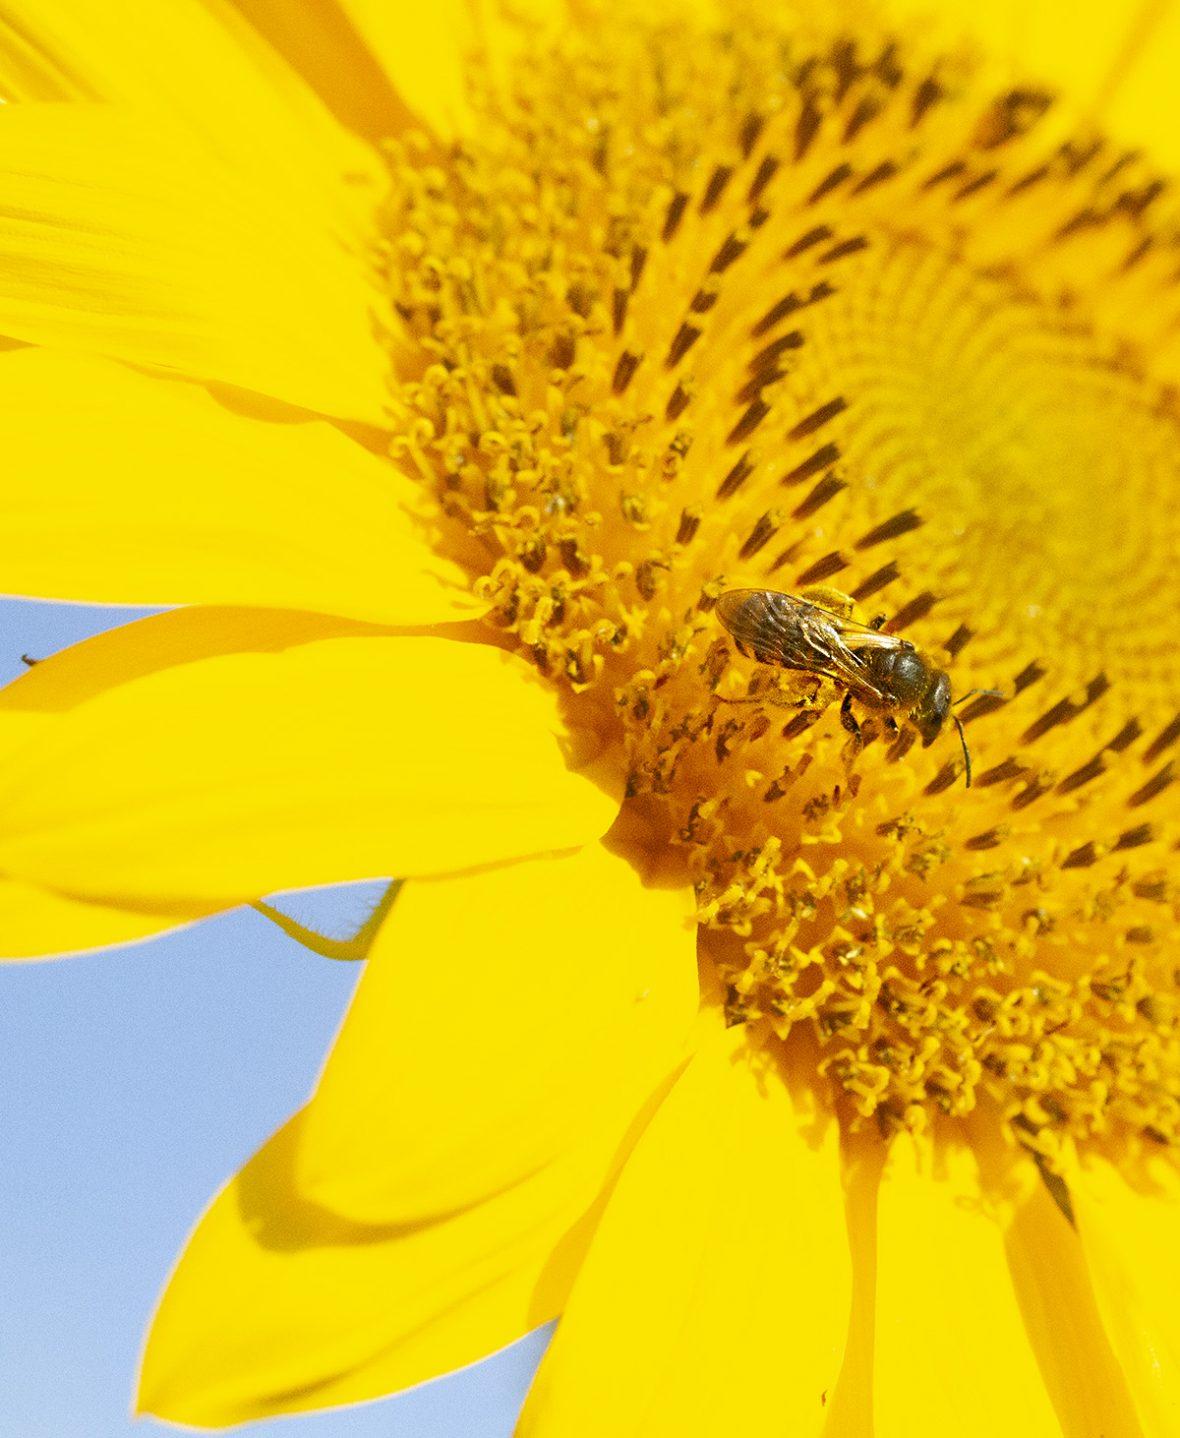 abeja posada sobre un girasol